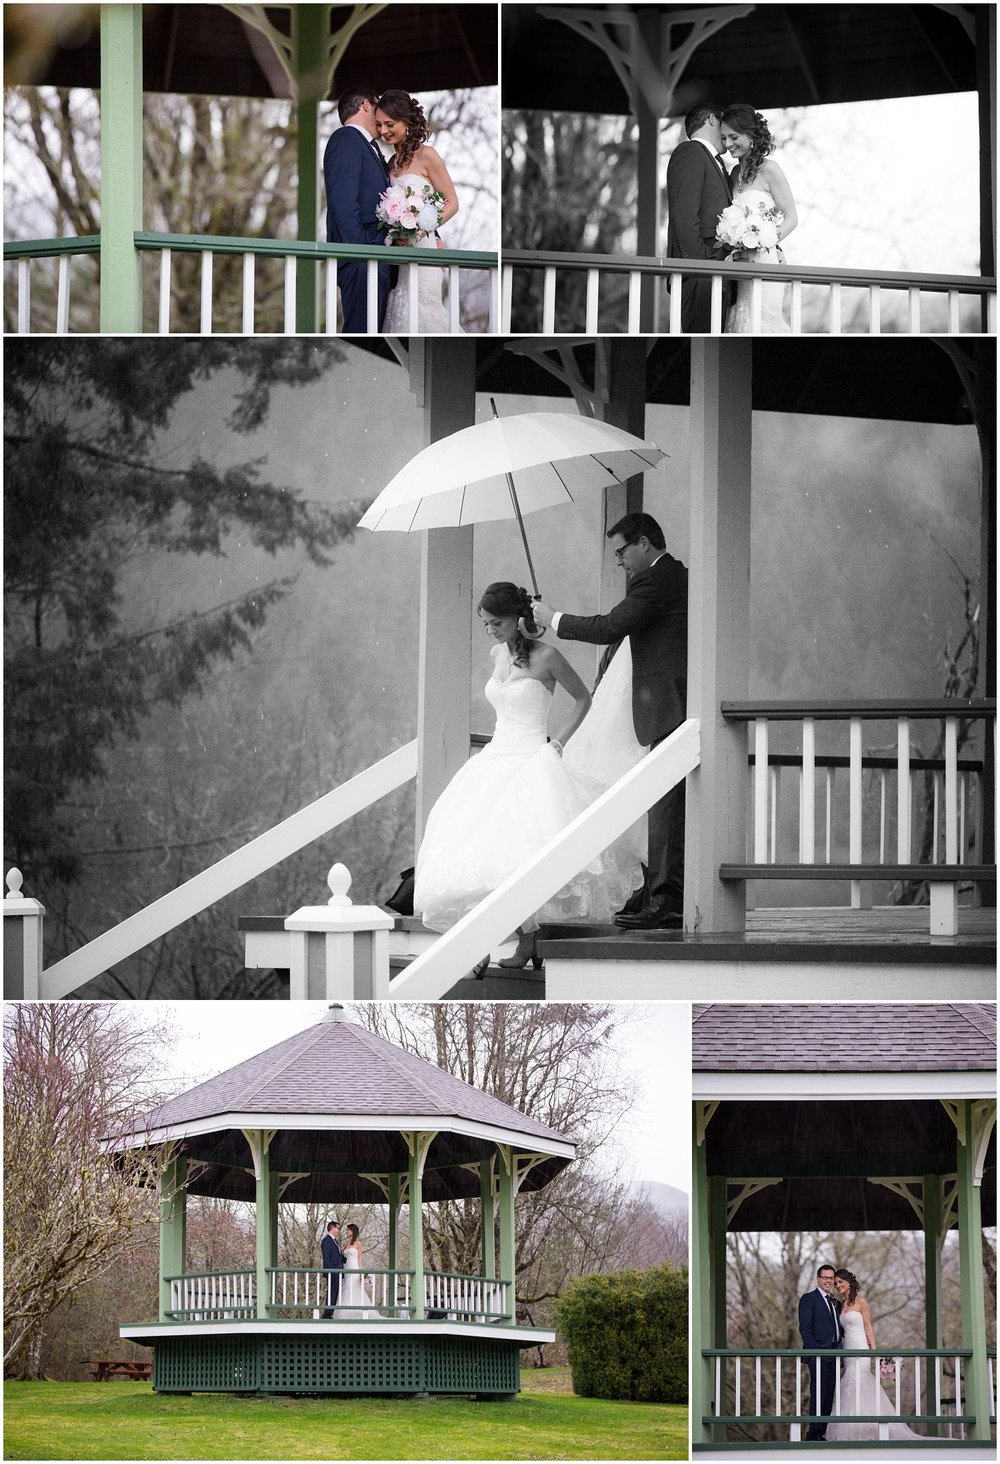 Amazing Day Photography - Mission Wedding Photographer - Eighteen Pastures Wedding - Hayward Lake Wedding - Spring Wedding (9).jpg